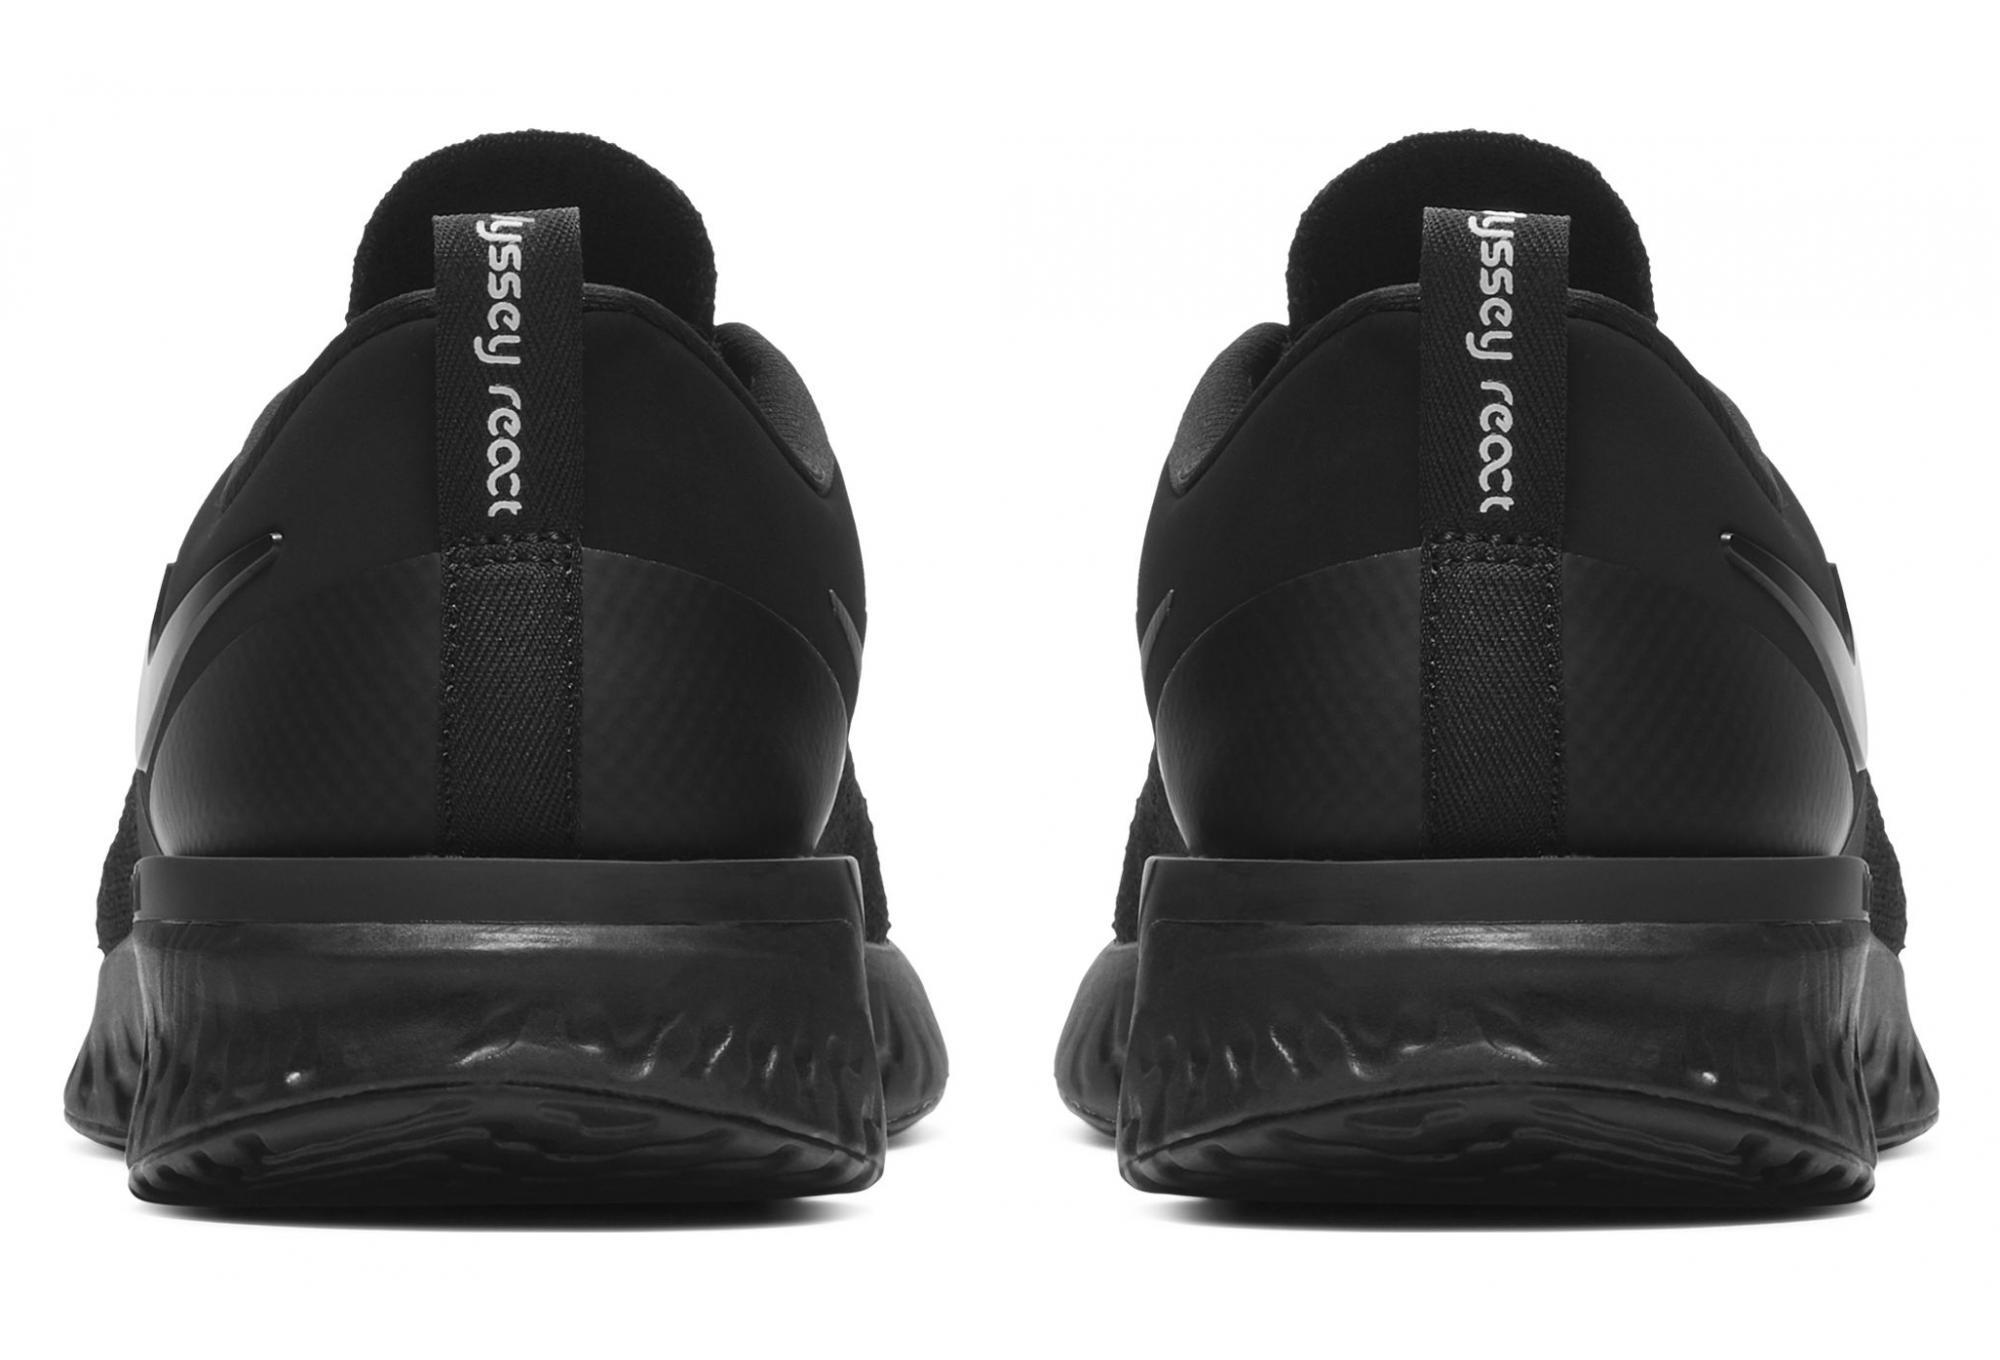 Nike Odyssey React Flyknit 2 Black White Women  10eabbe39